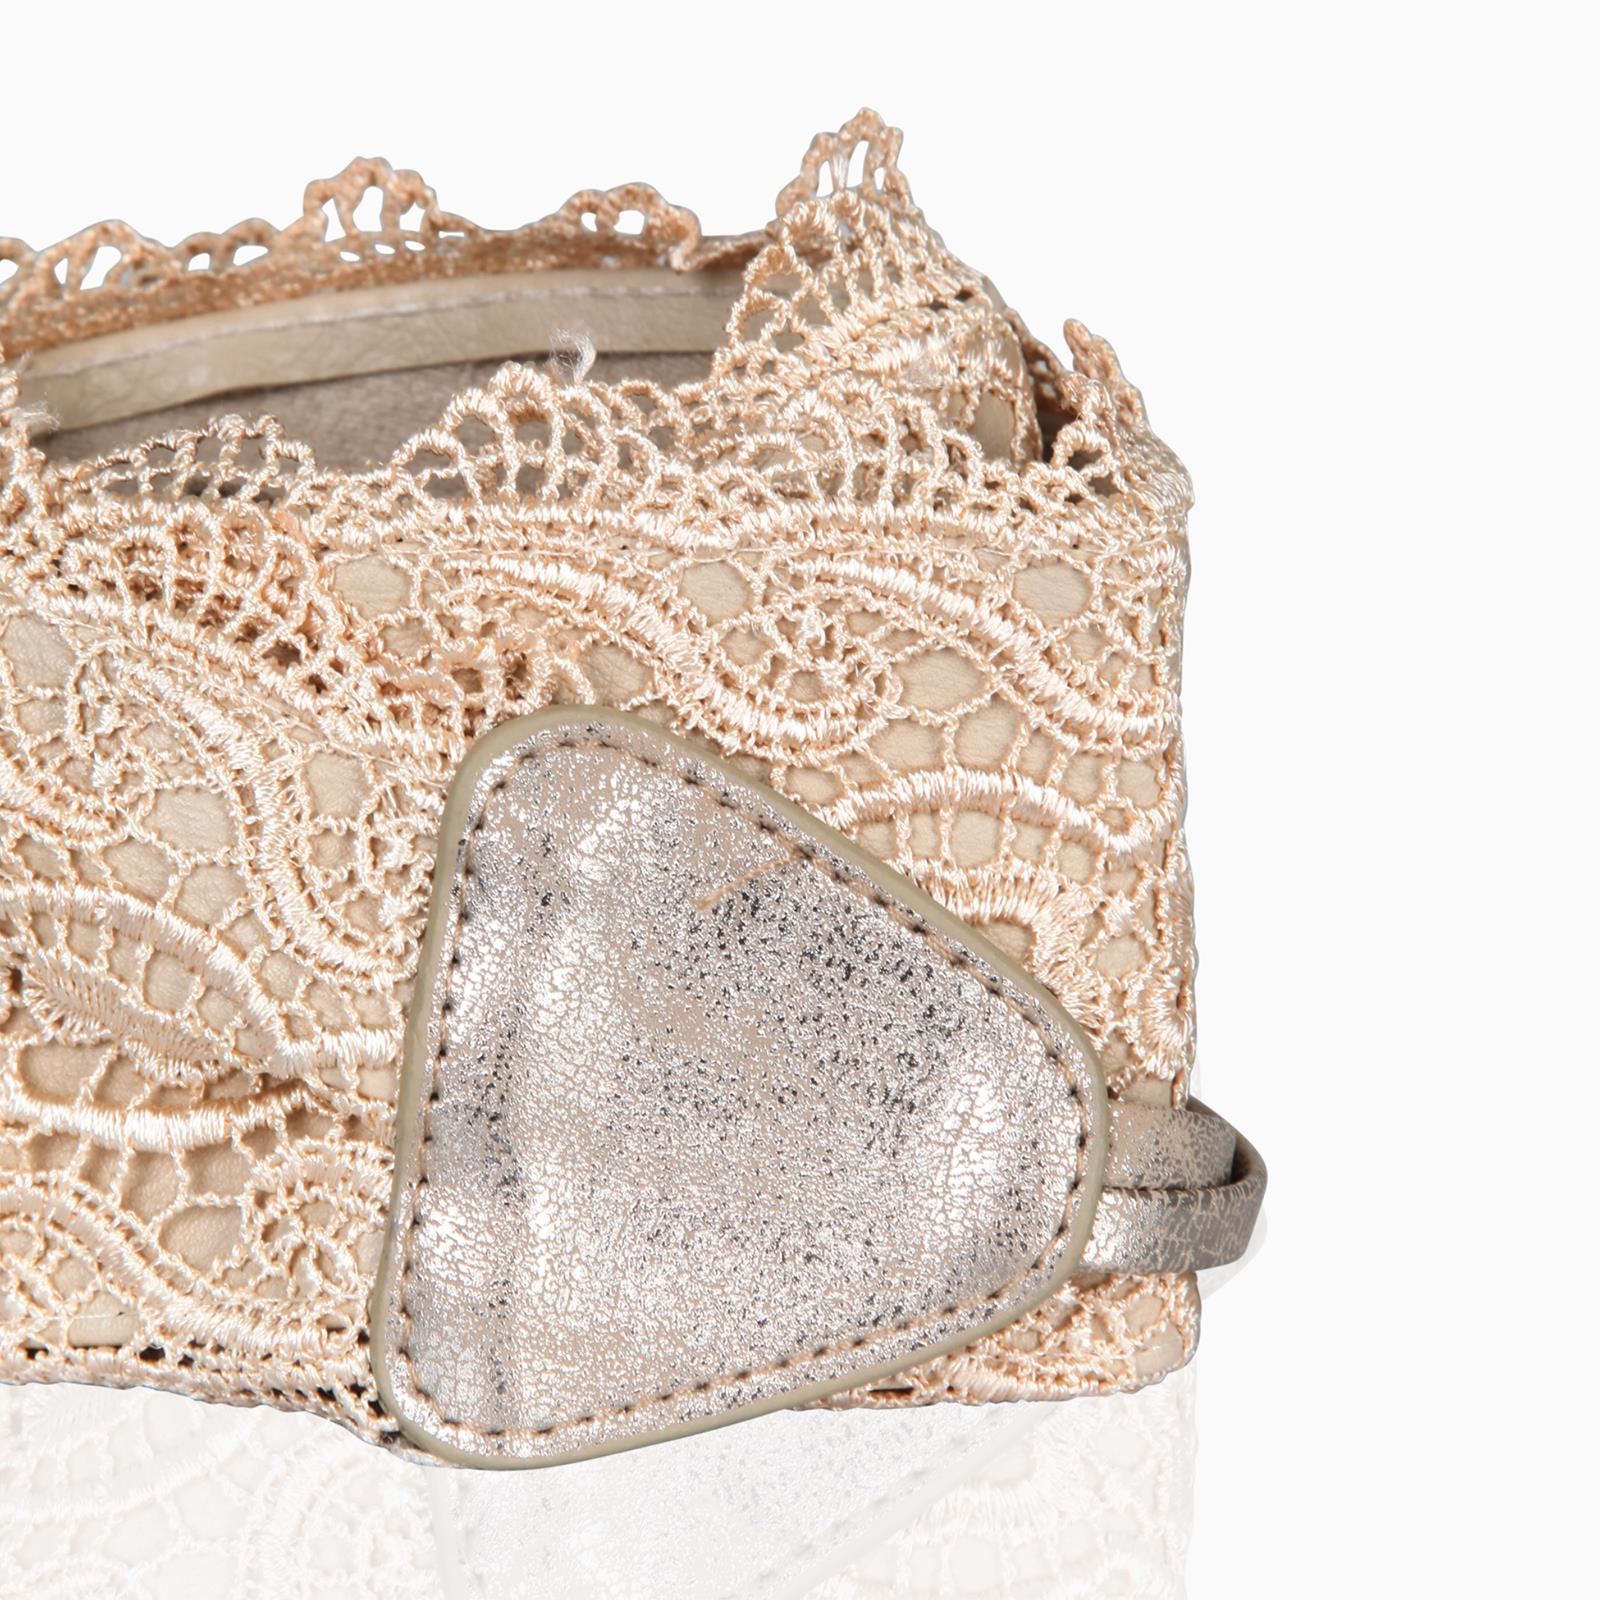 thumbnail 59 - Womens-Ladies-Wide-Waist-Belt-Floral-Waistband-Pattern-Band-Crochet-Lace-Corset